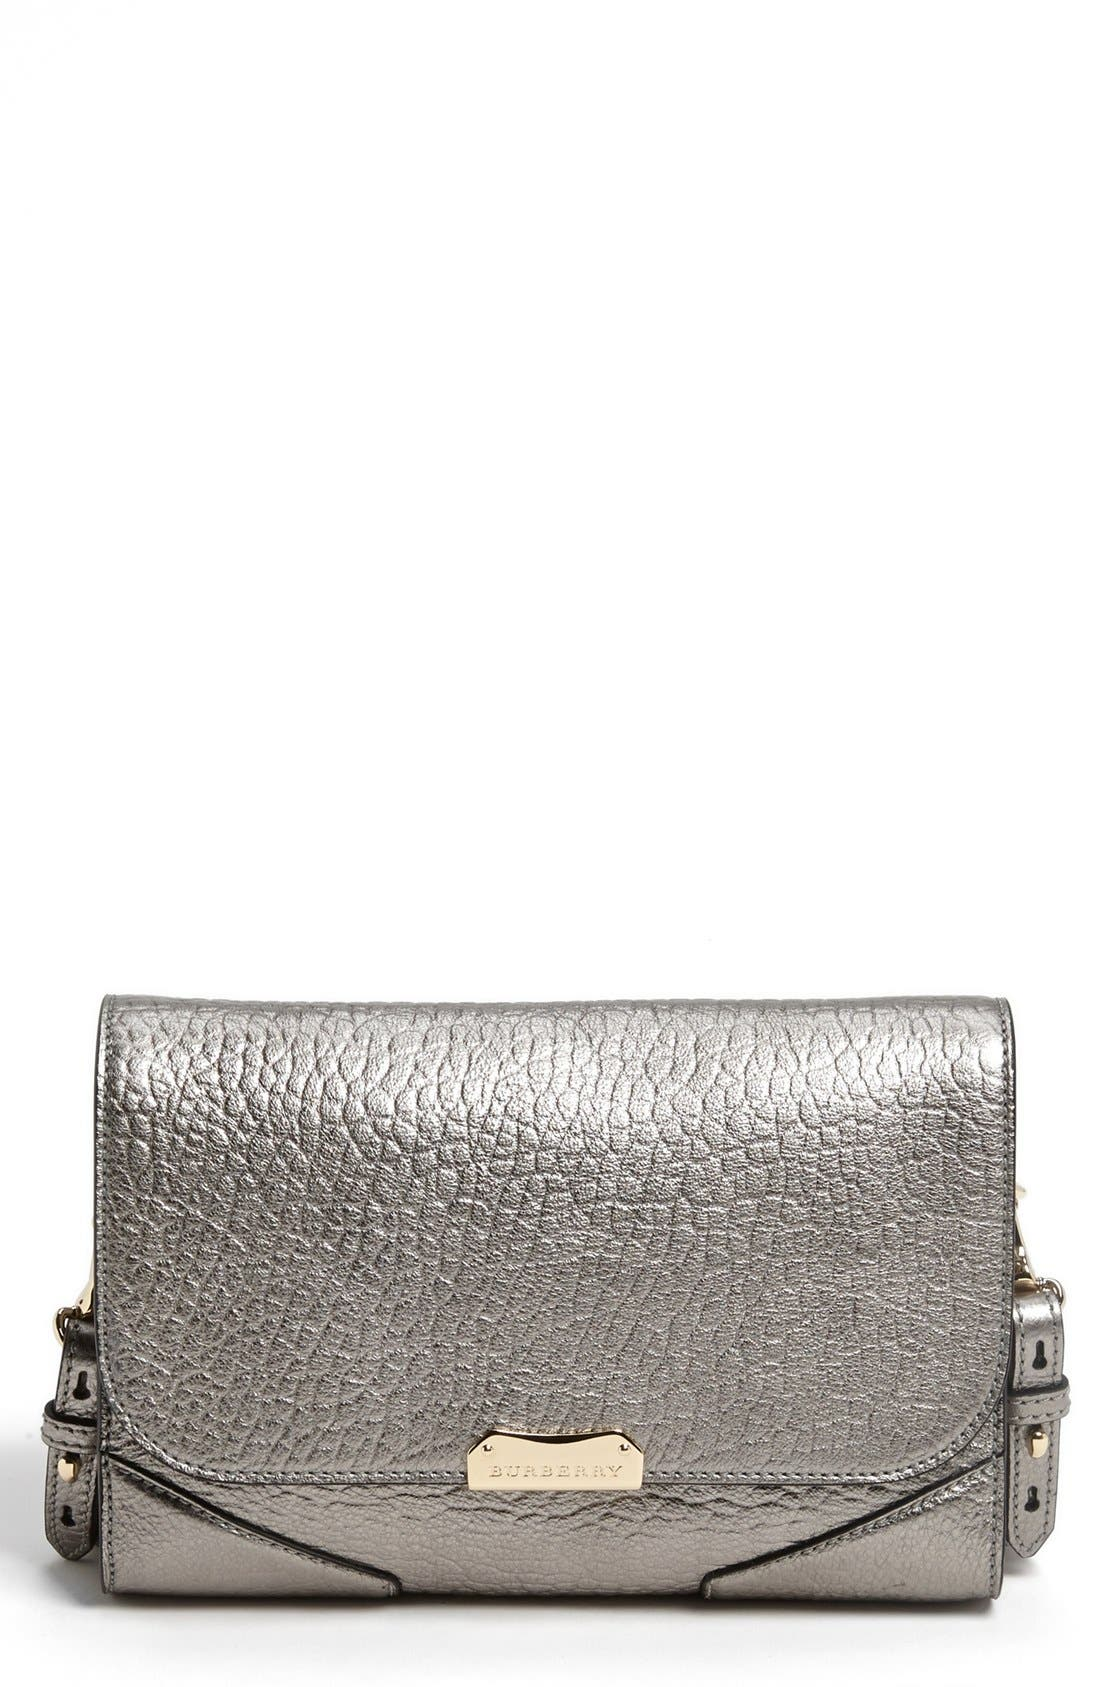 Main Image - Burberry 'Abbott - Small' Crossbody Bag